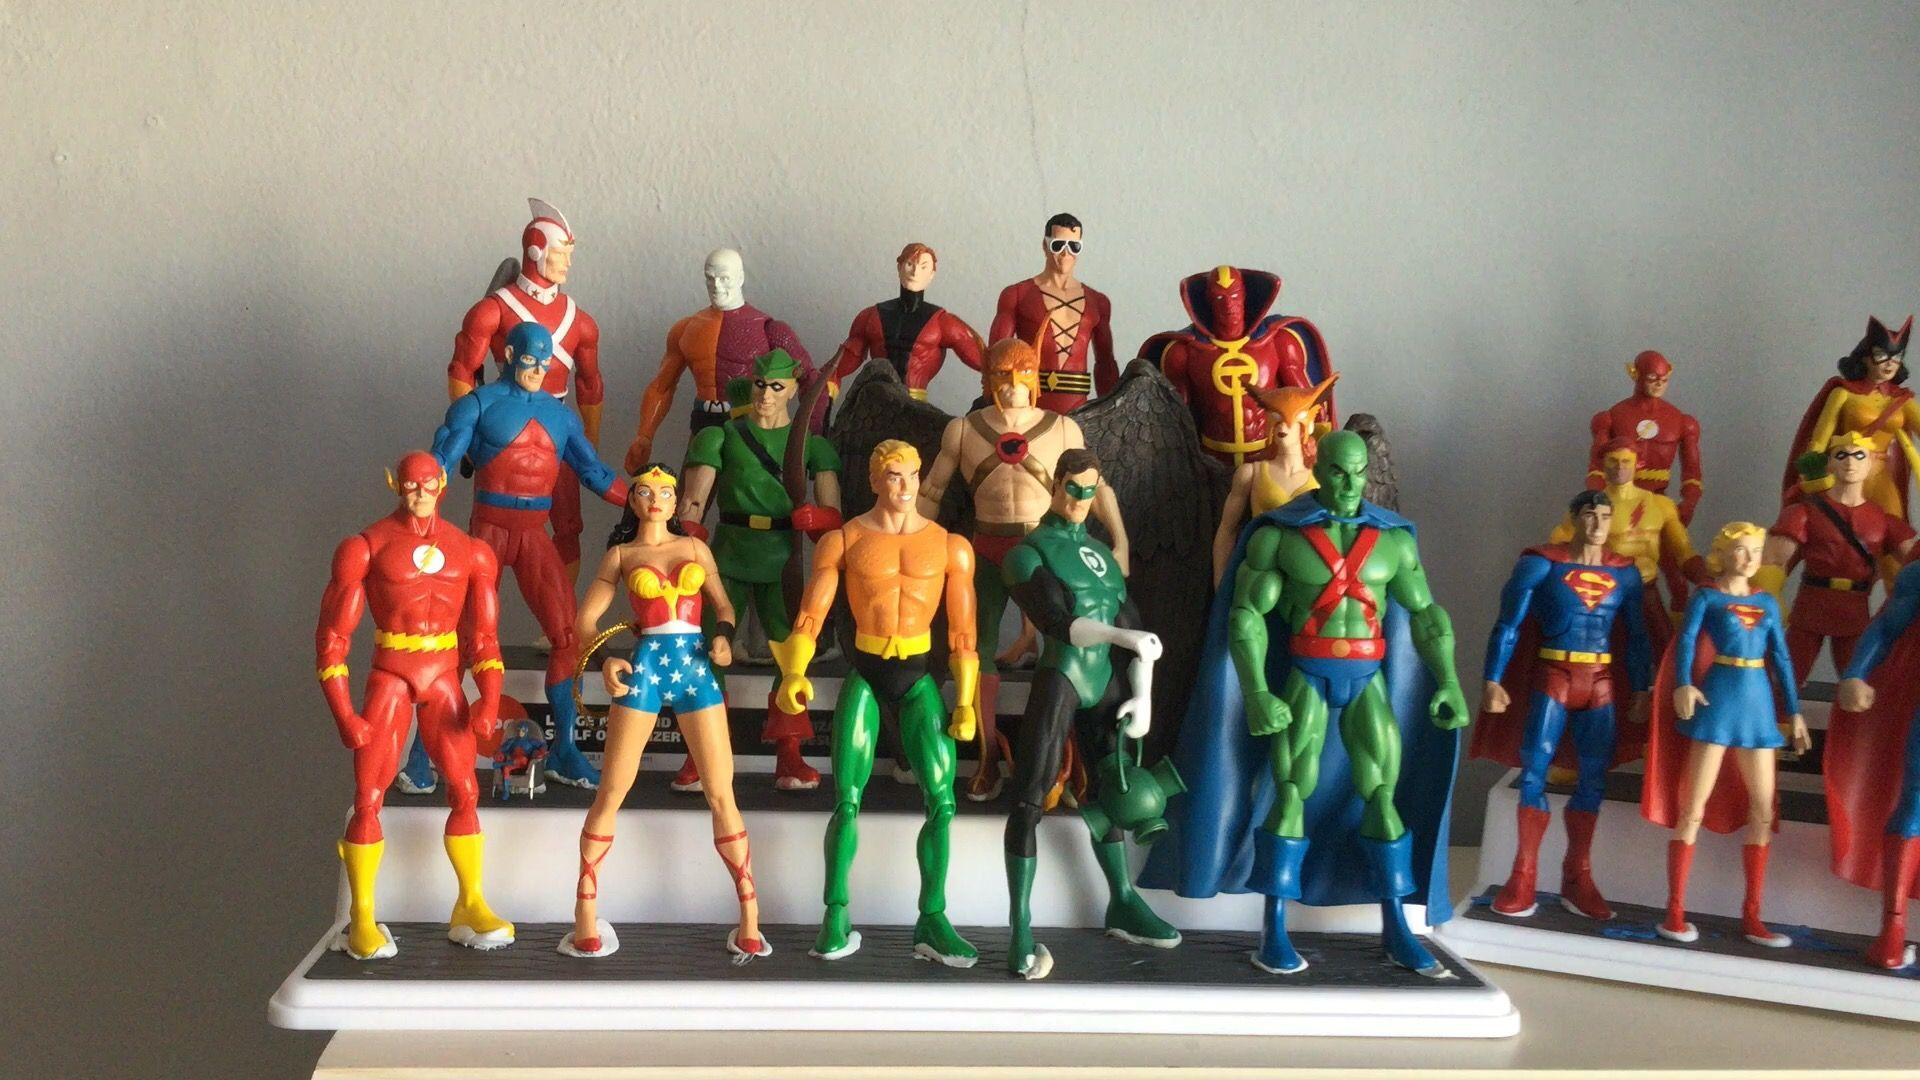 Original Justice League Other Dc Characters Original Justice League Action Figures Collection Justice League